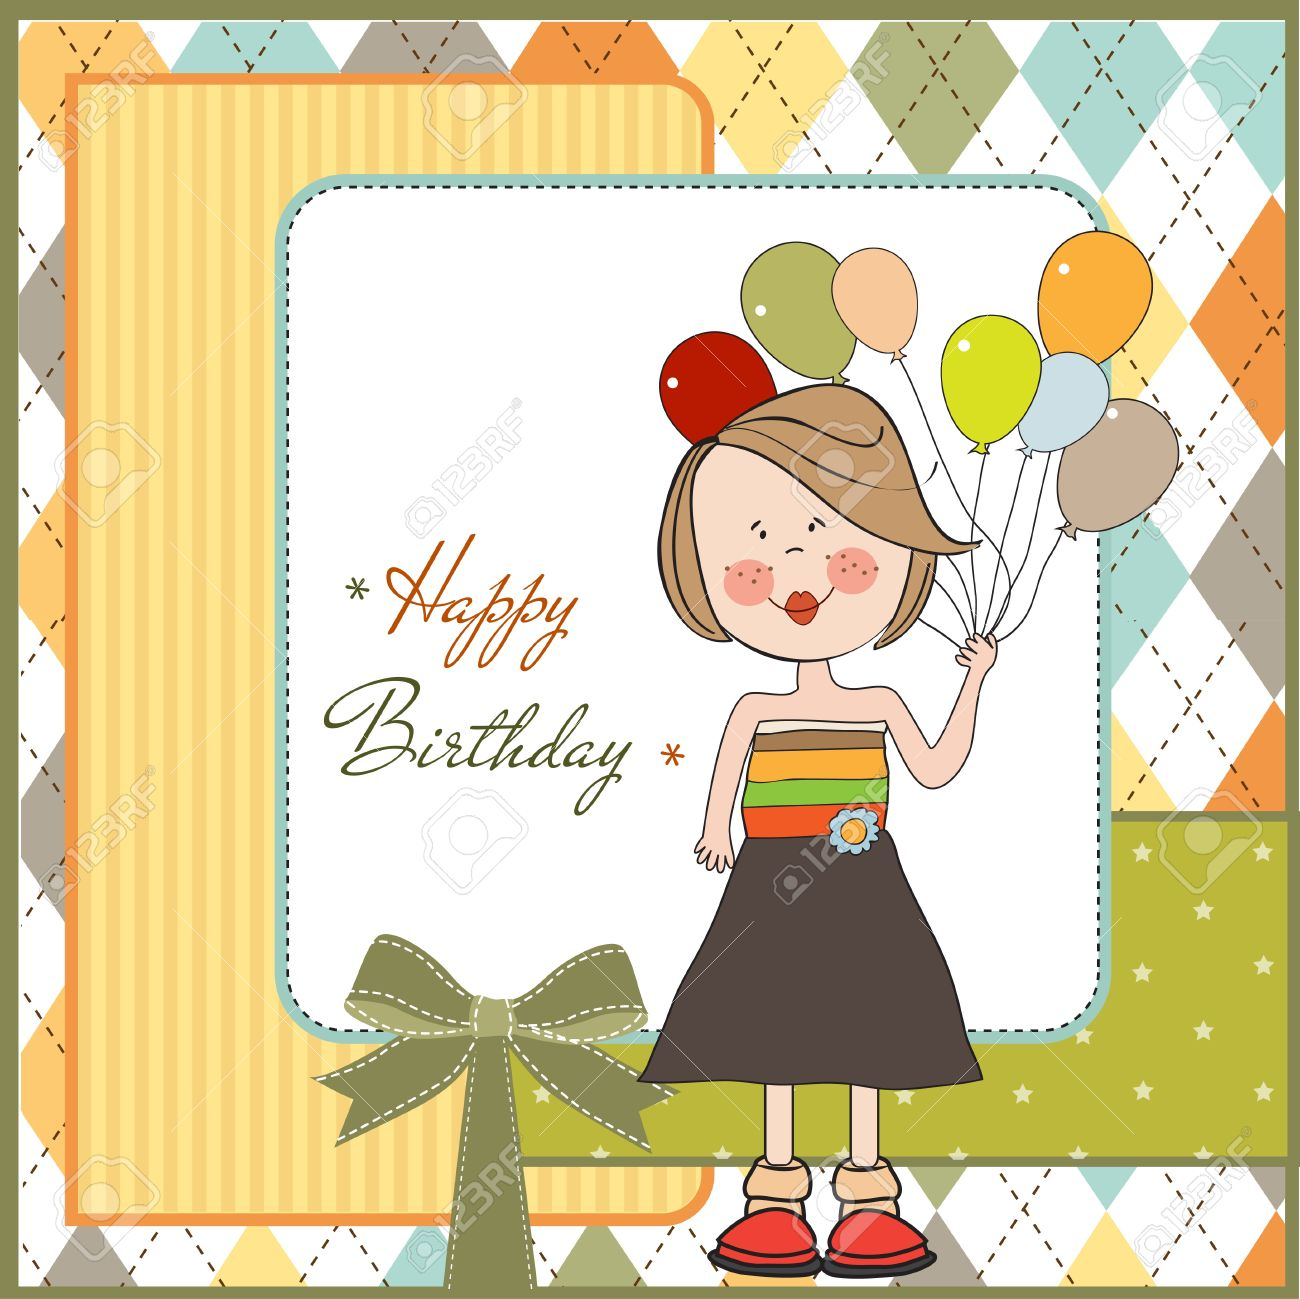 Happy birthday card with funny girl royalty free cliparts vectors happy birthday card with funny girl stock vector 14707403 bookmarktalkfo Gallery